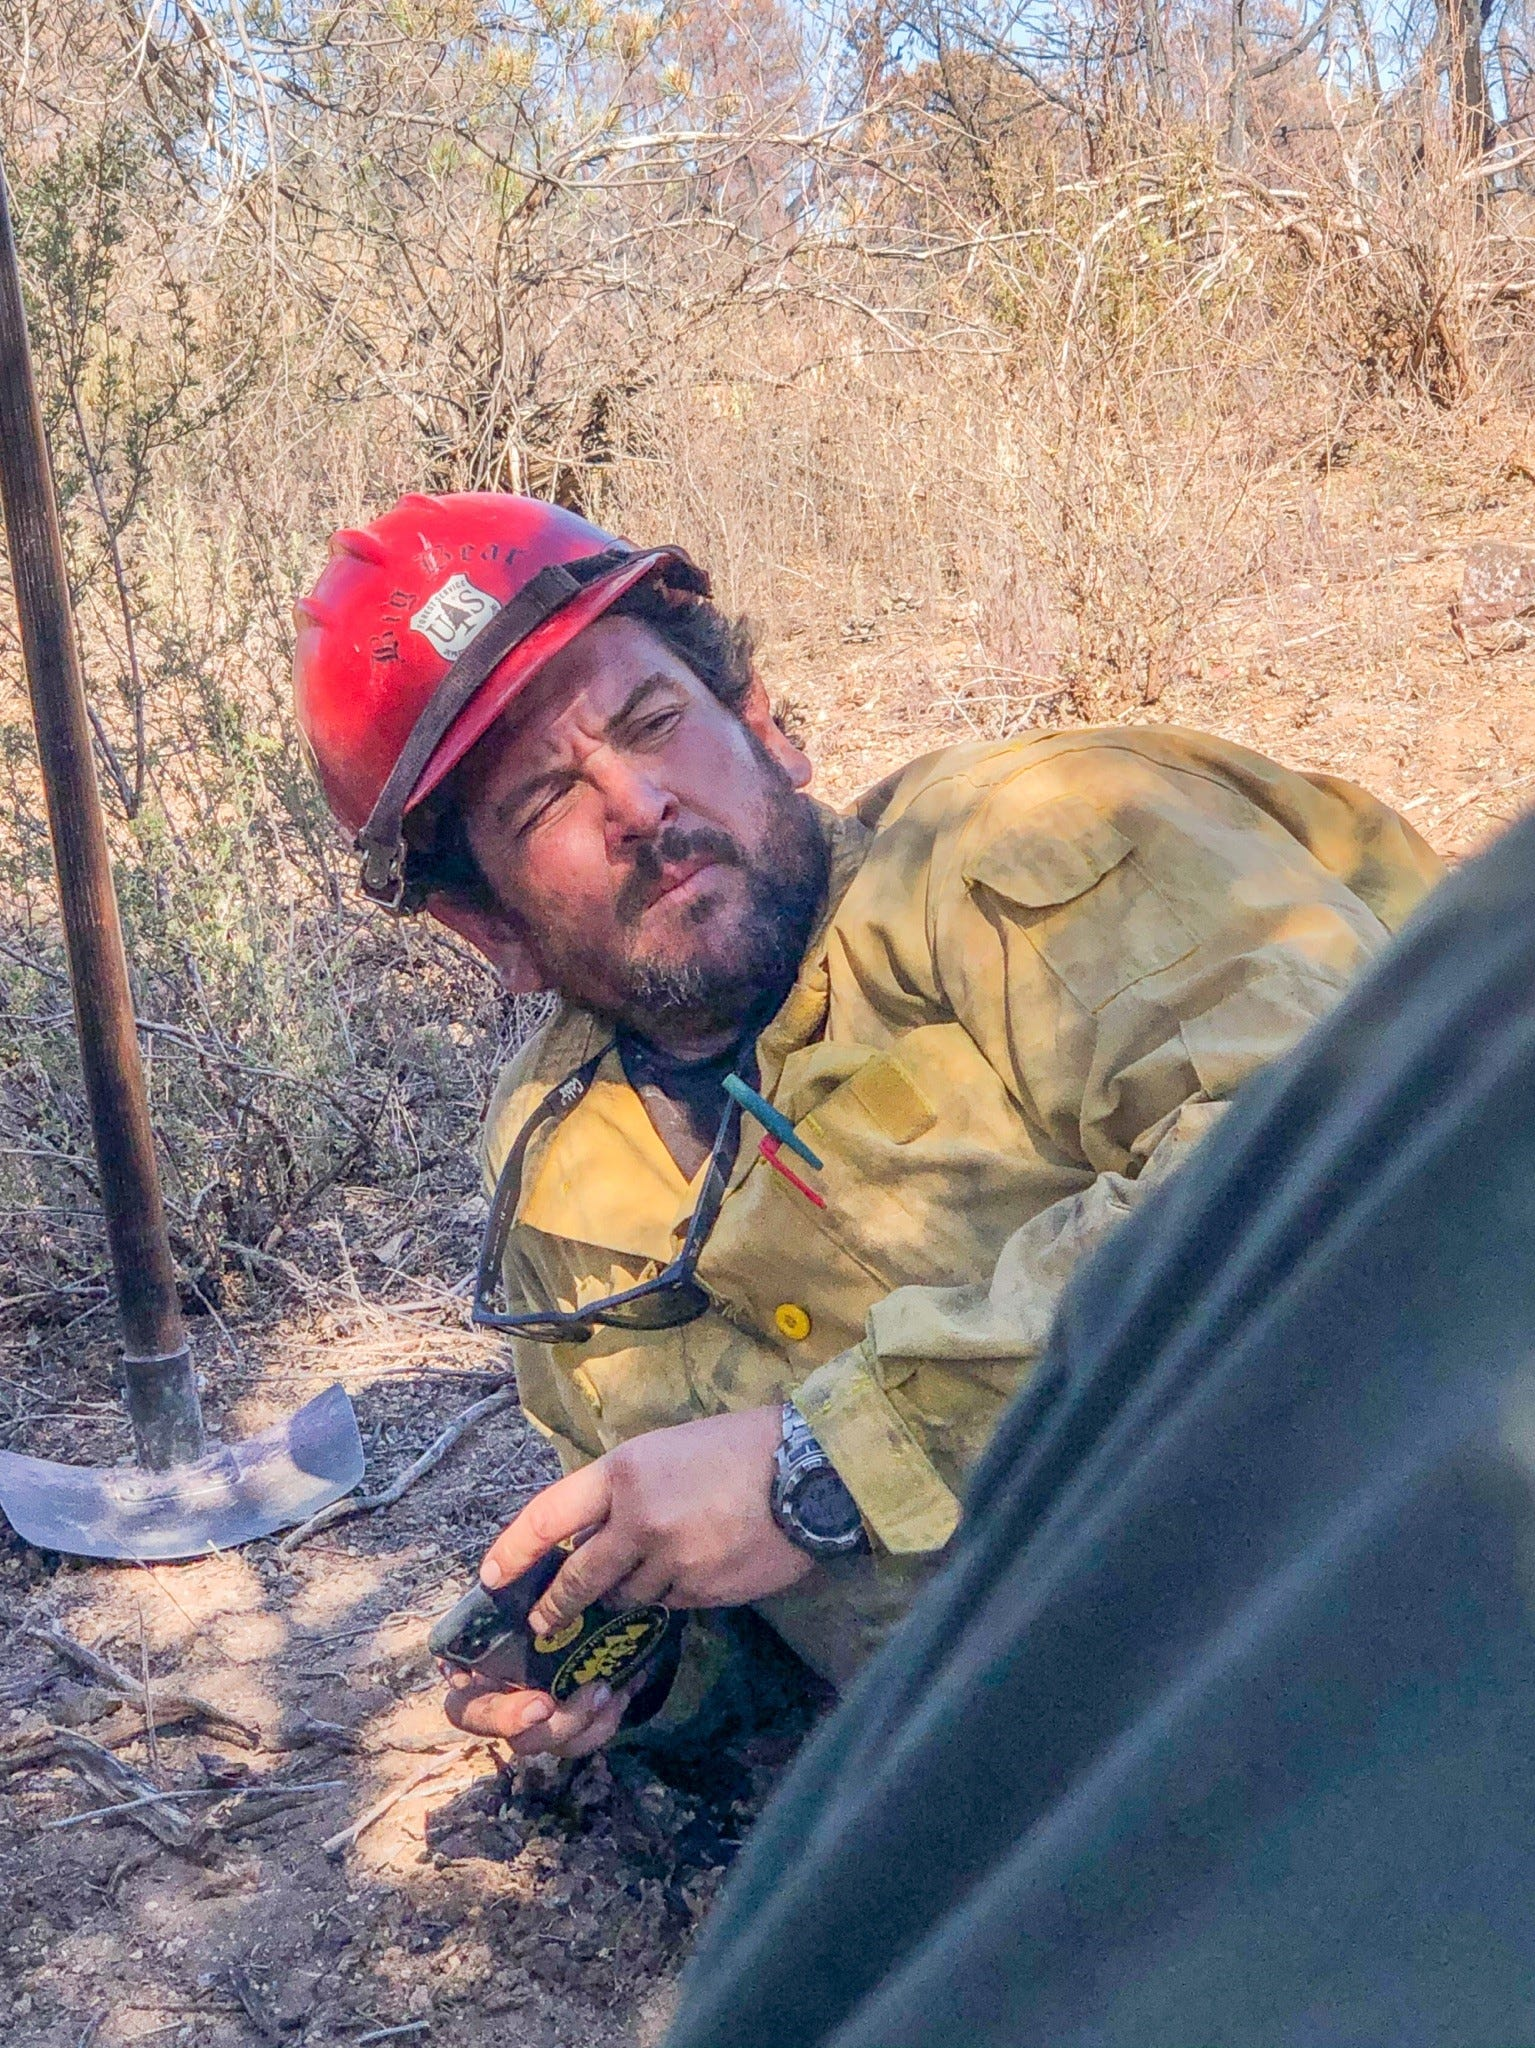 memorial service for firefighter charlie morton how to watch online firefighter charlie morton